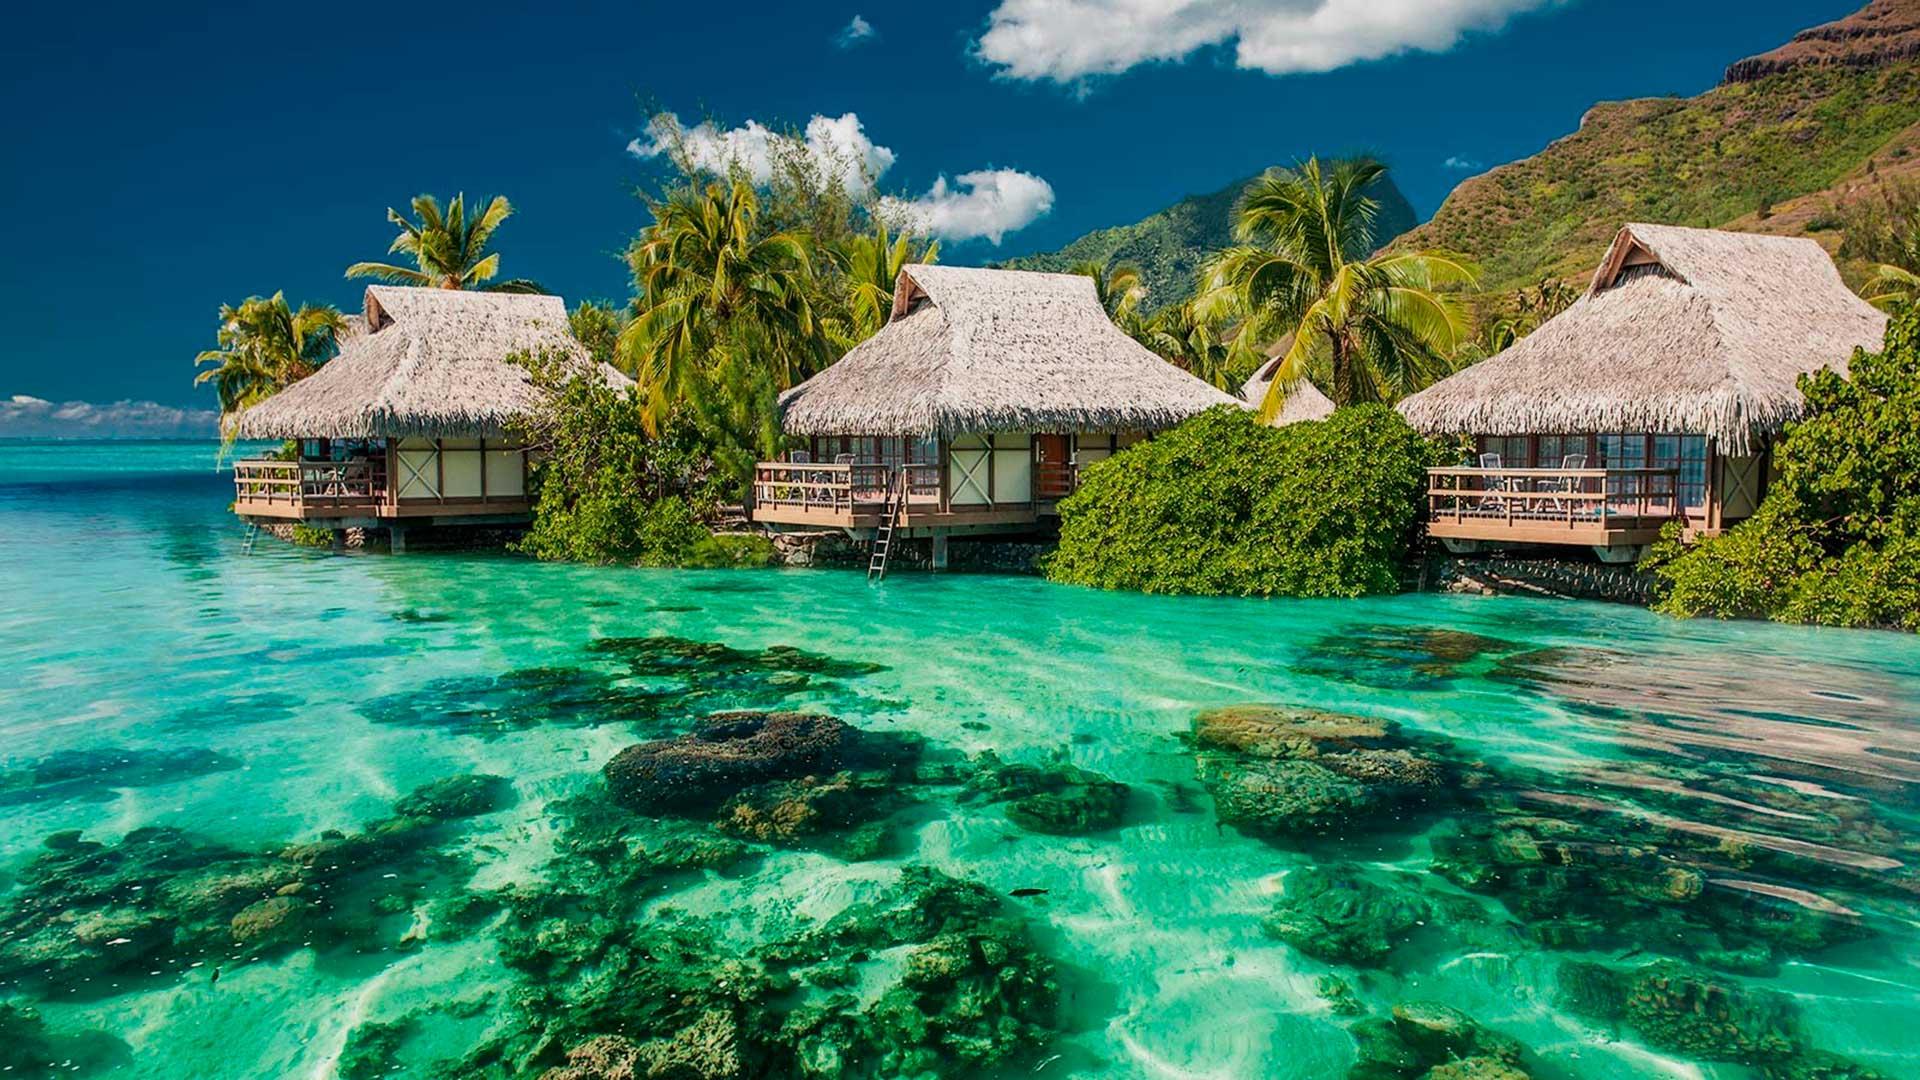 Islas Paradisíacas de Polinesia